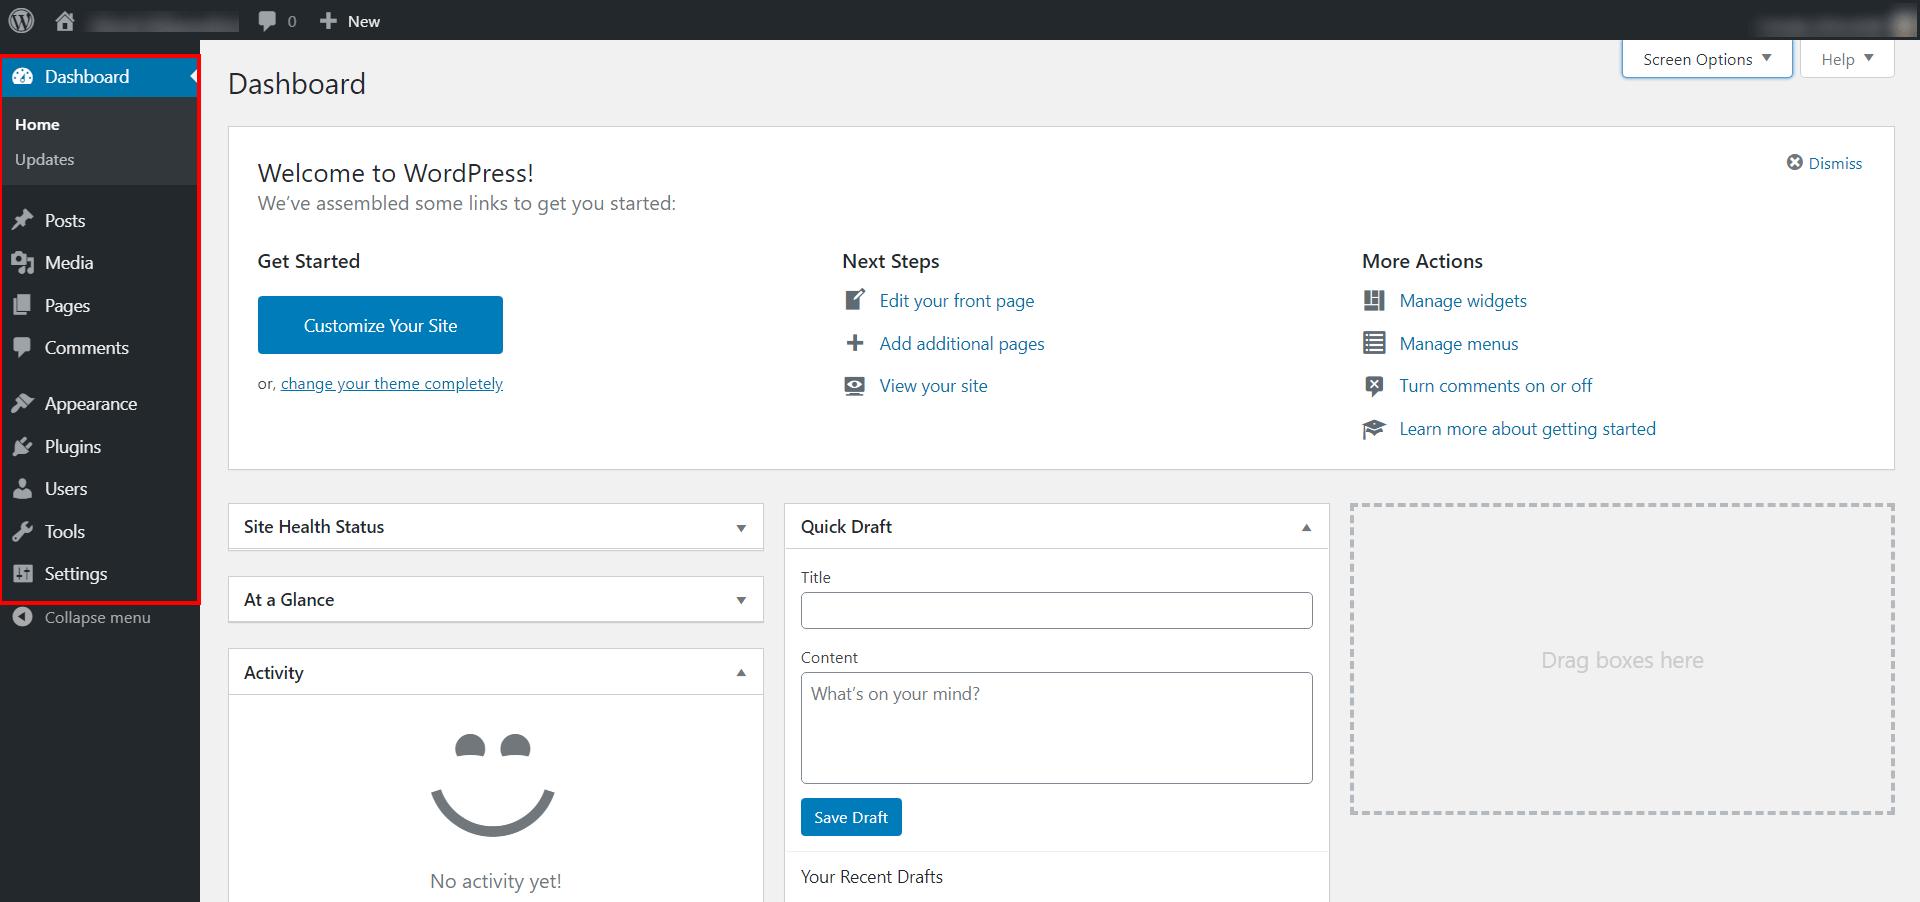 WordPress Dashboard 2020